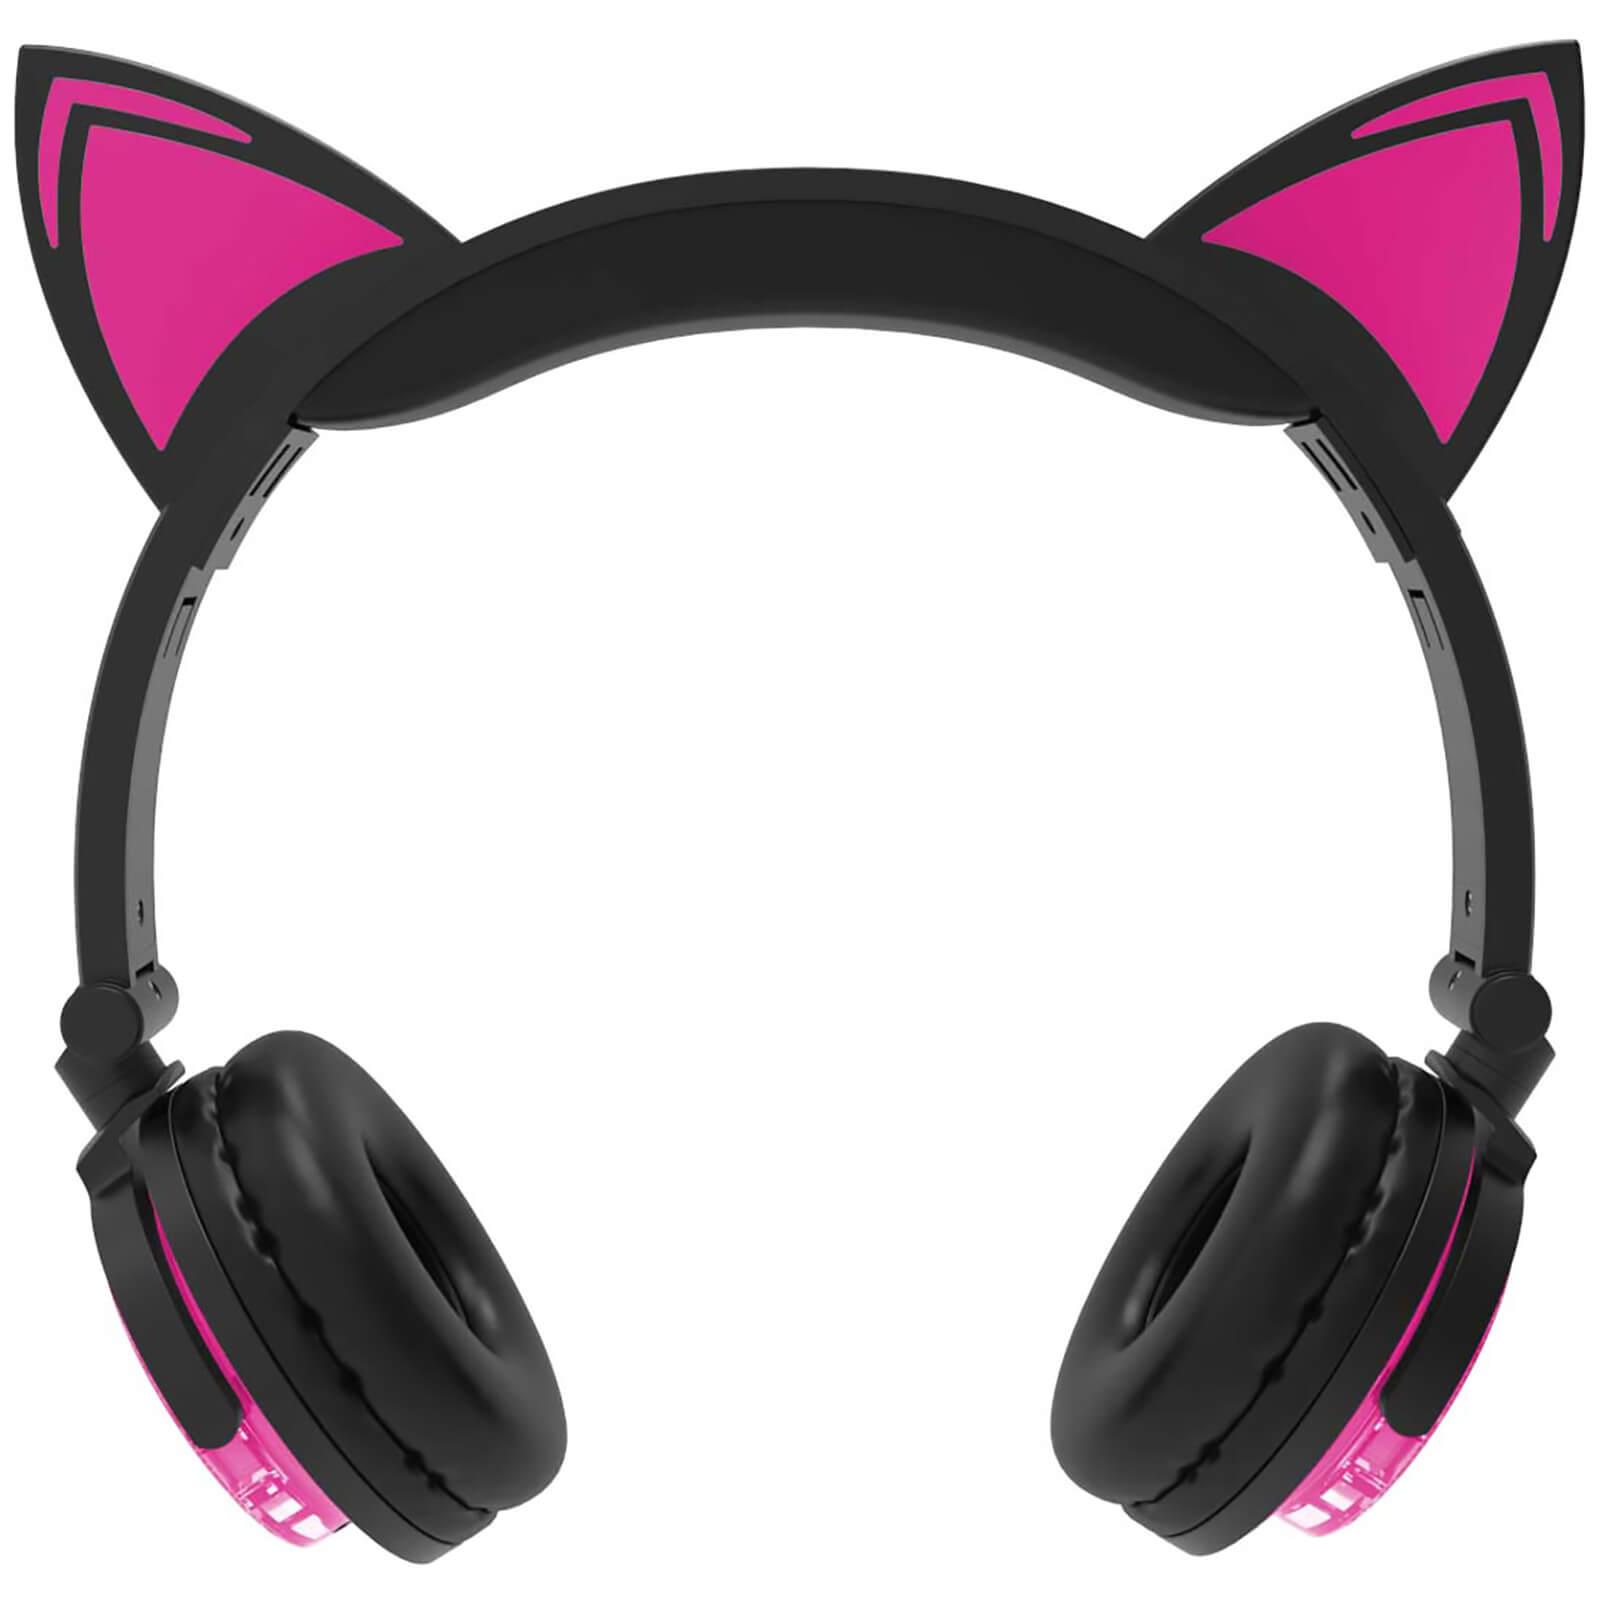 LIVE LOVE MUSIC 猫耳式耳机带麦克风